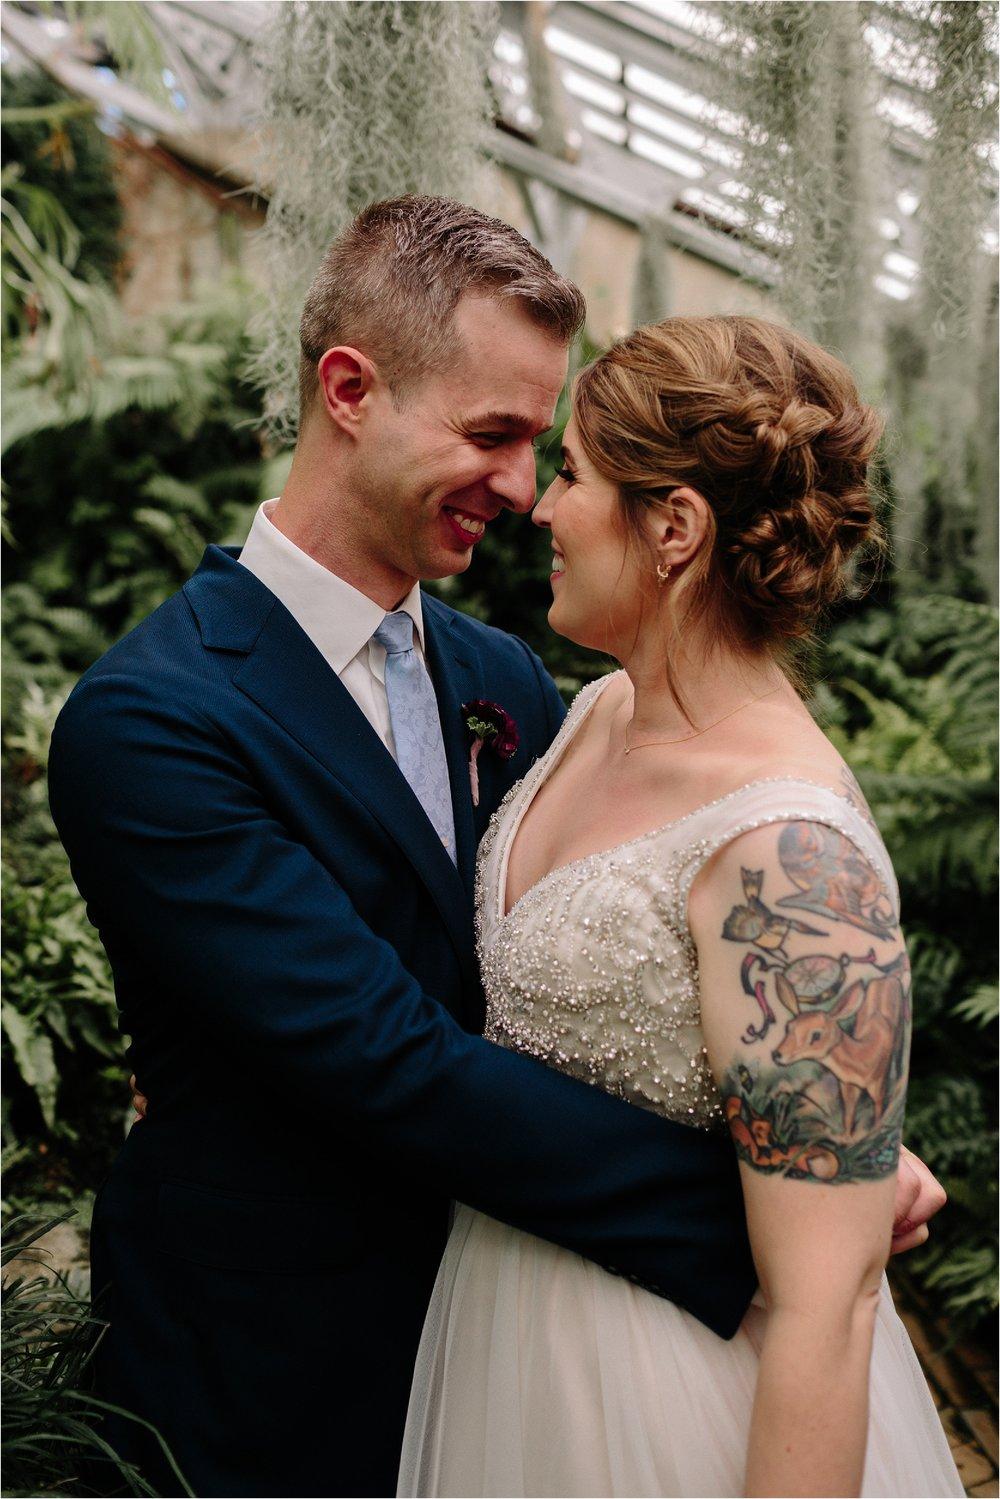 garfield-park-conservatory-wedding-107.jpg